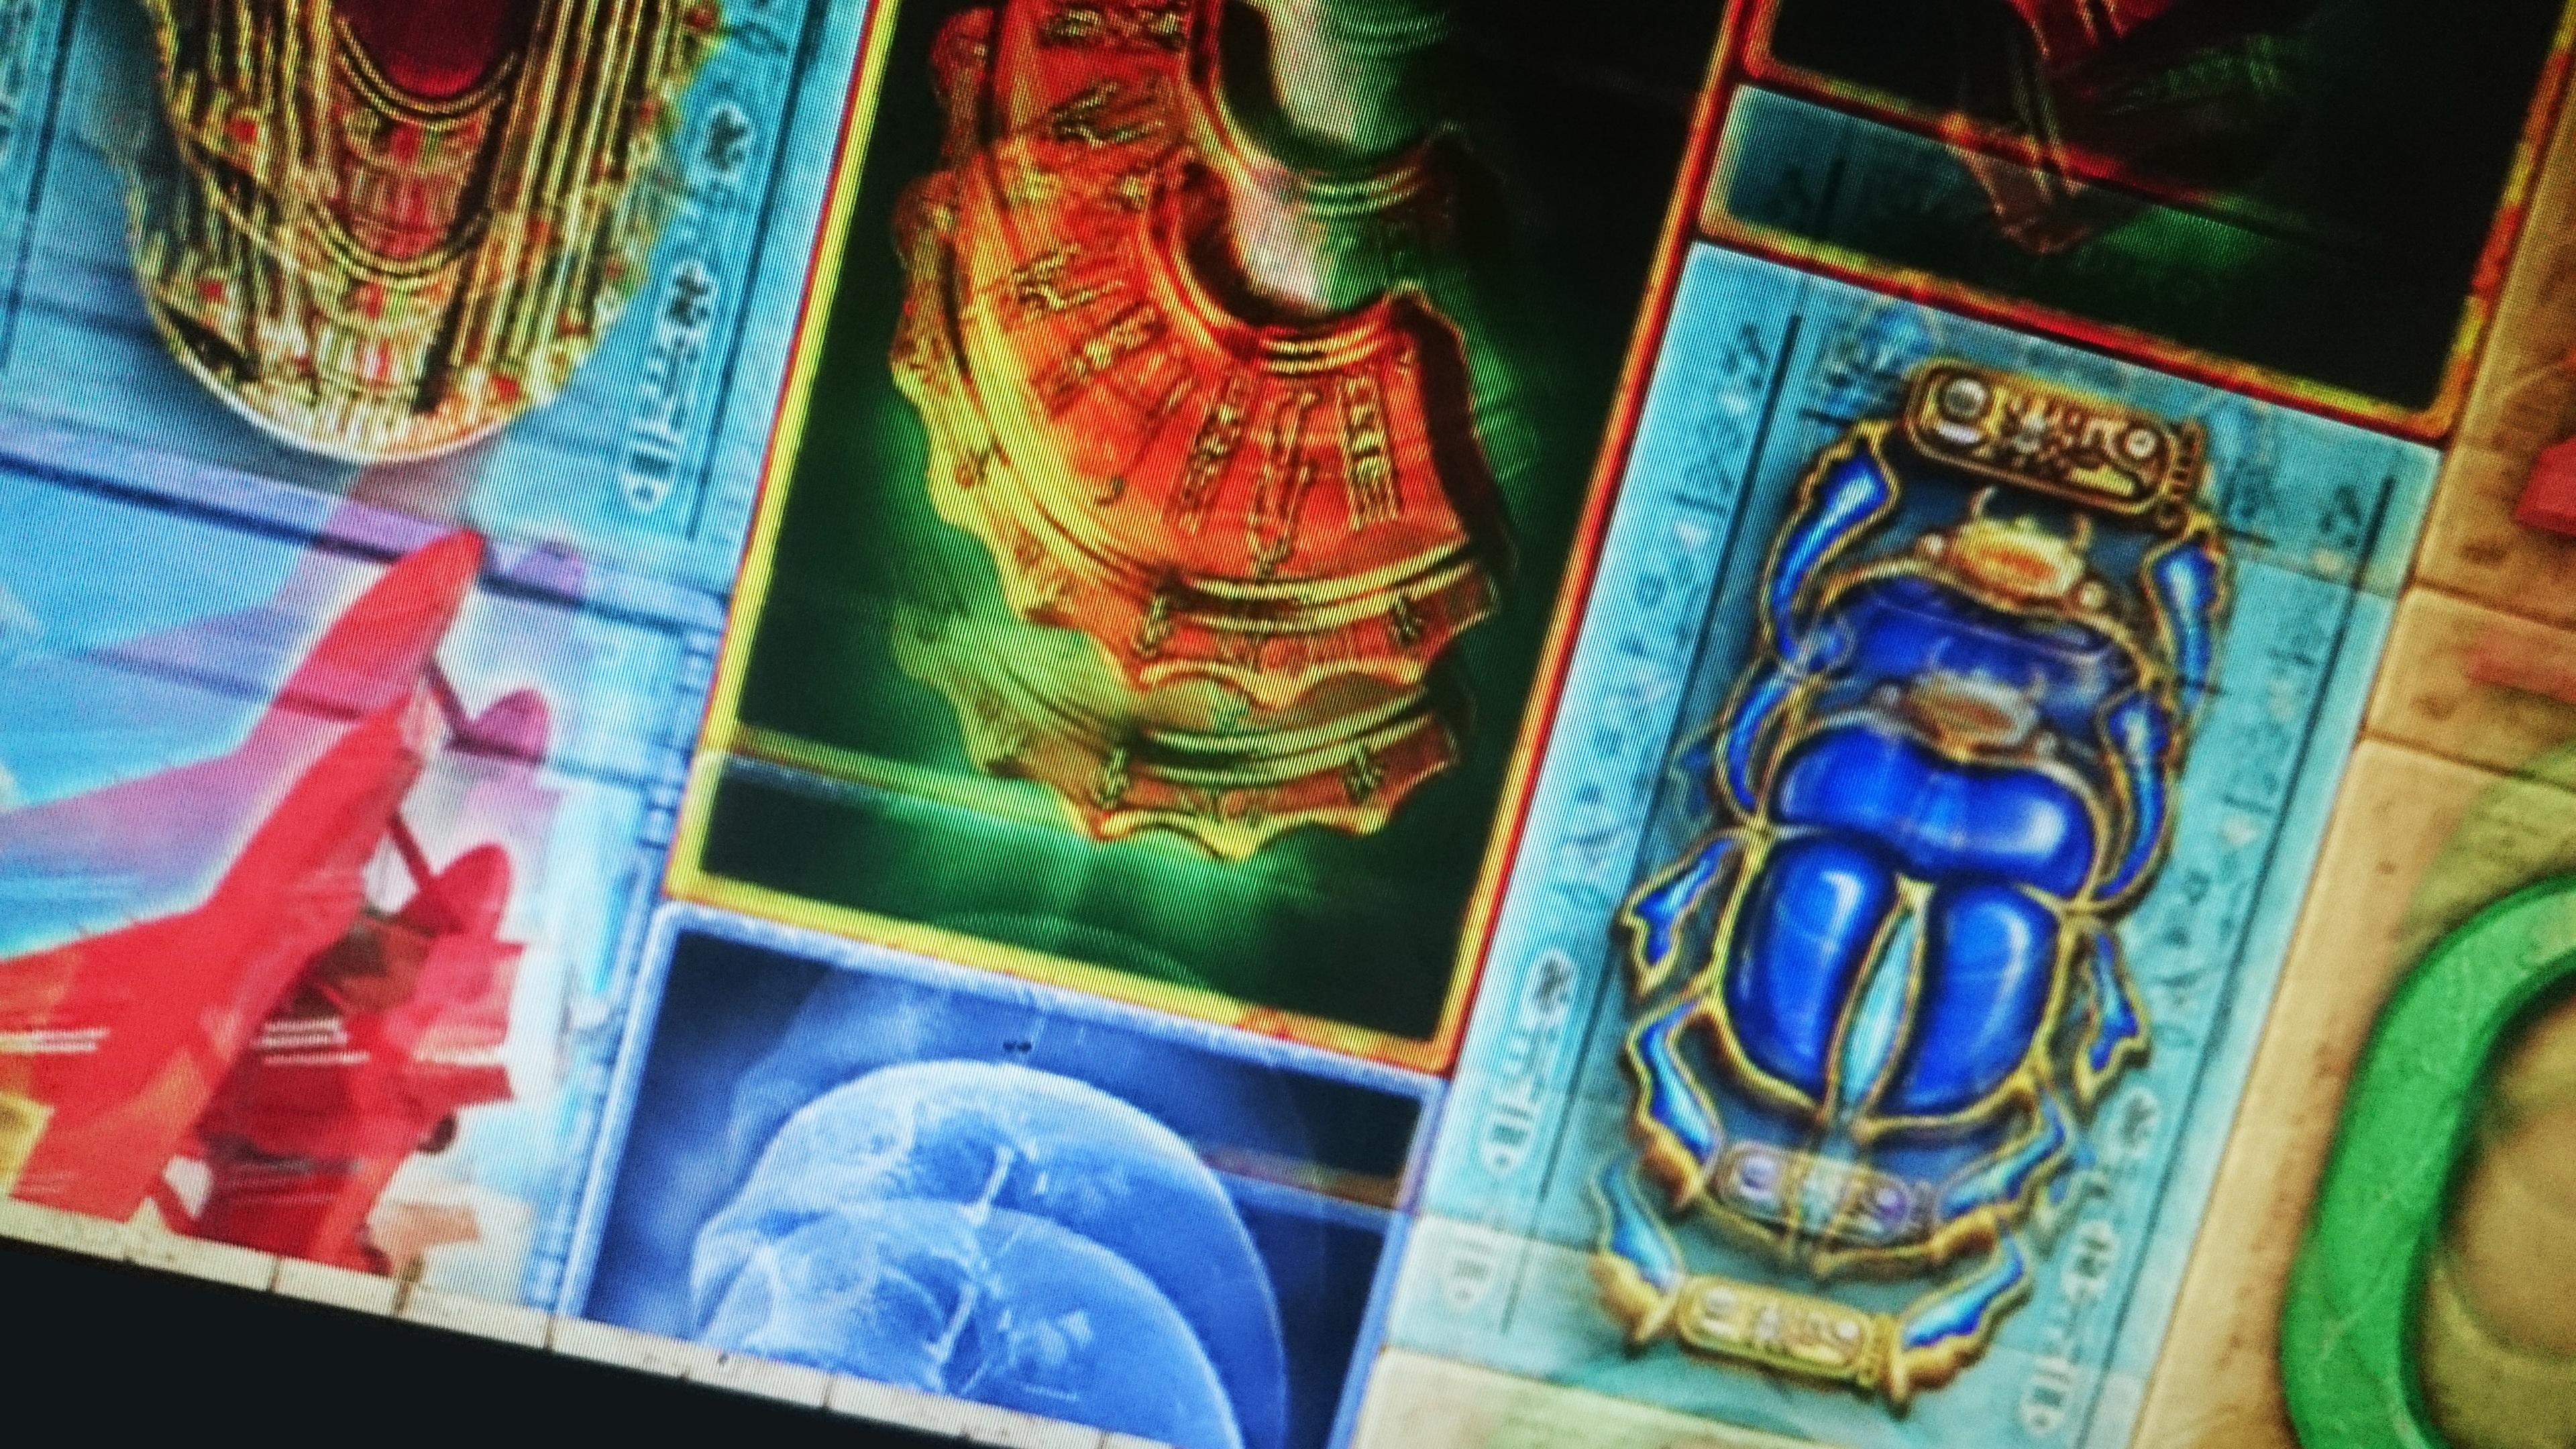 Free Images : symbol, gamble, monitor, casino, games, luck, slot, jackpot, chance, three ...